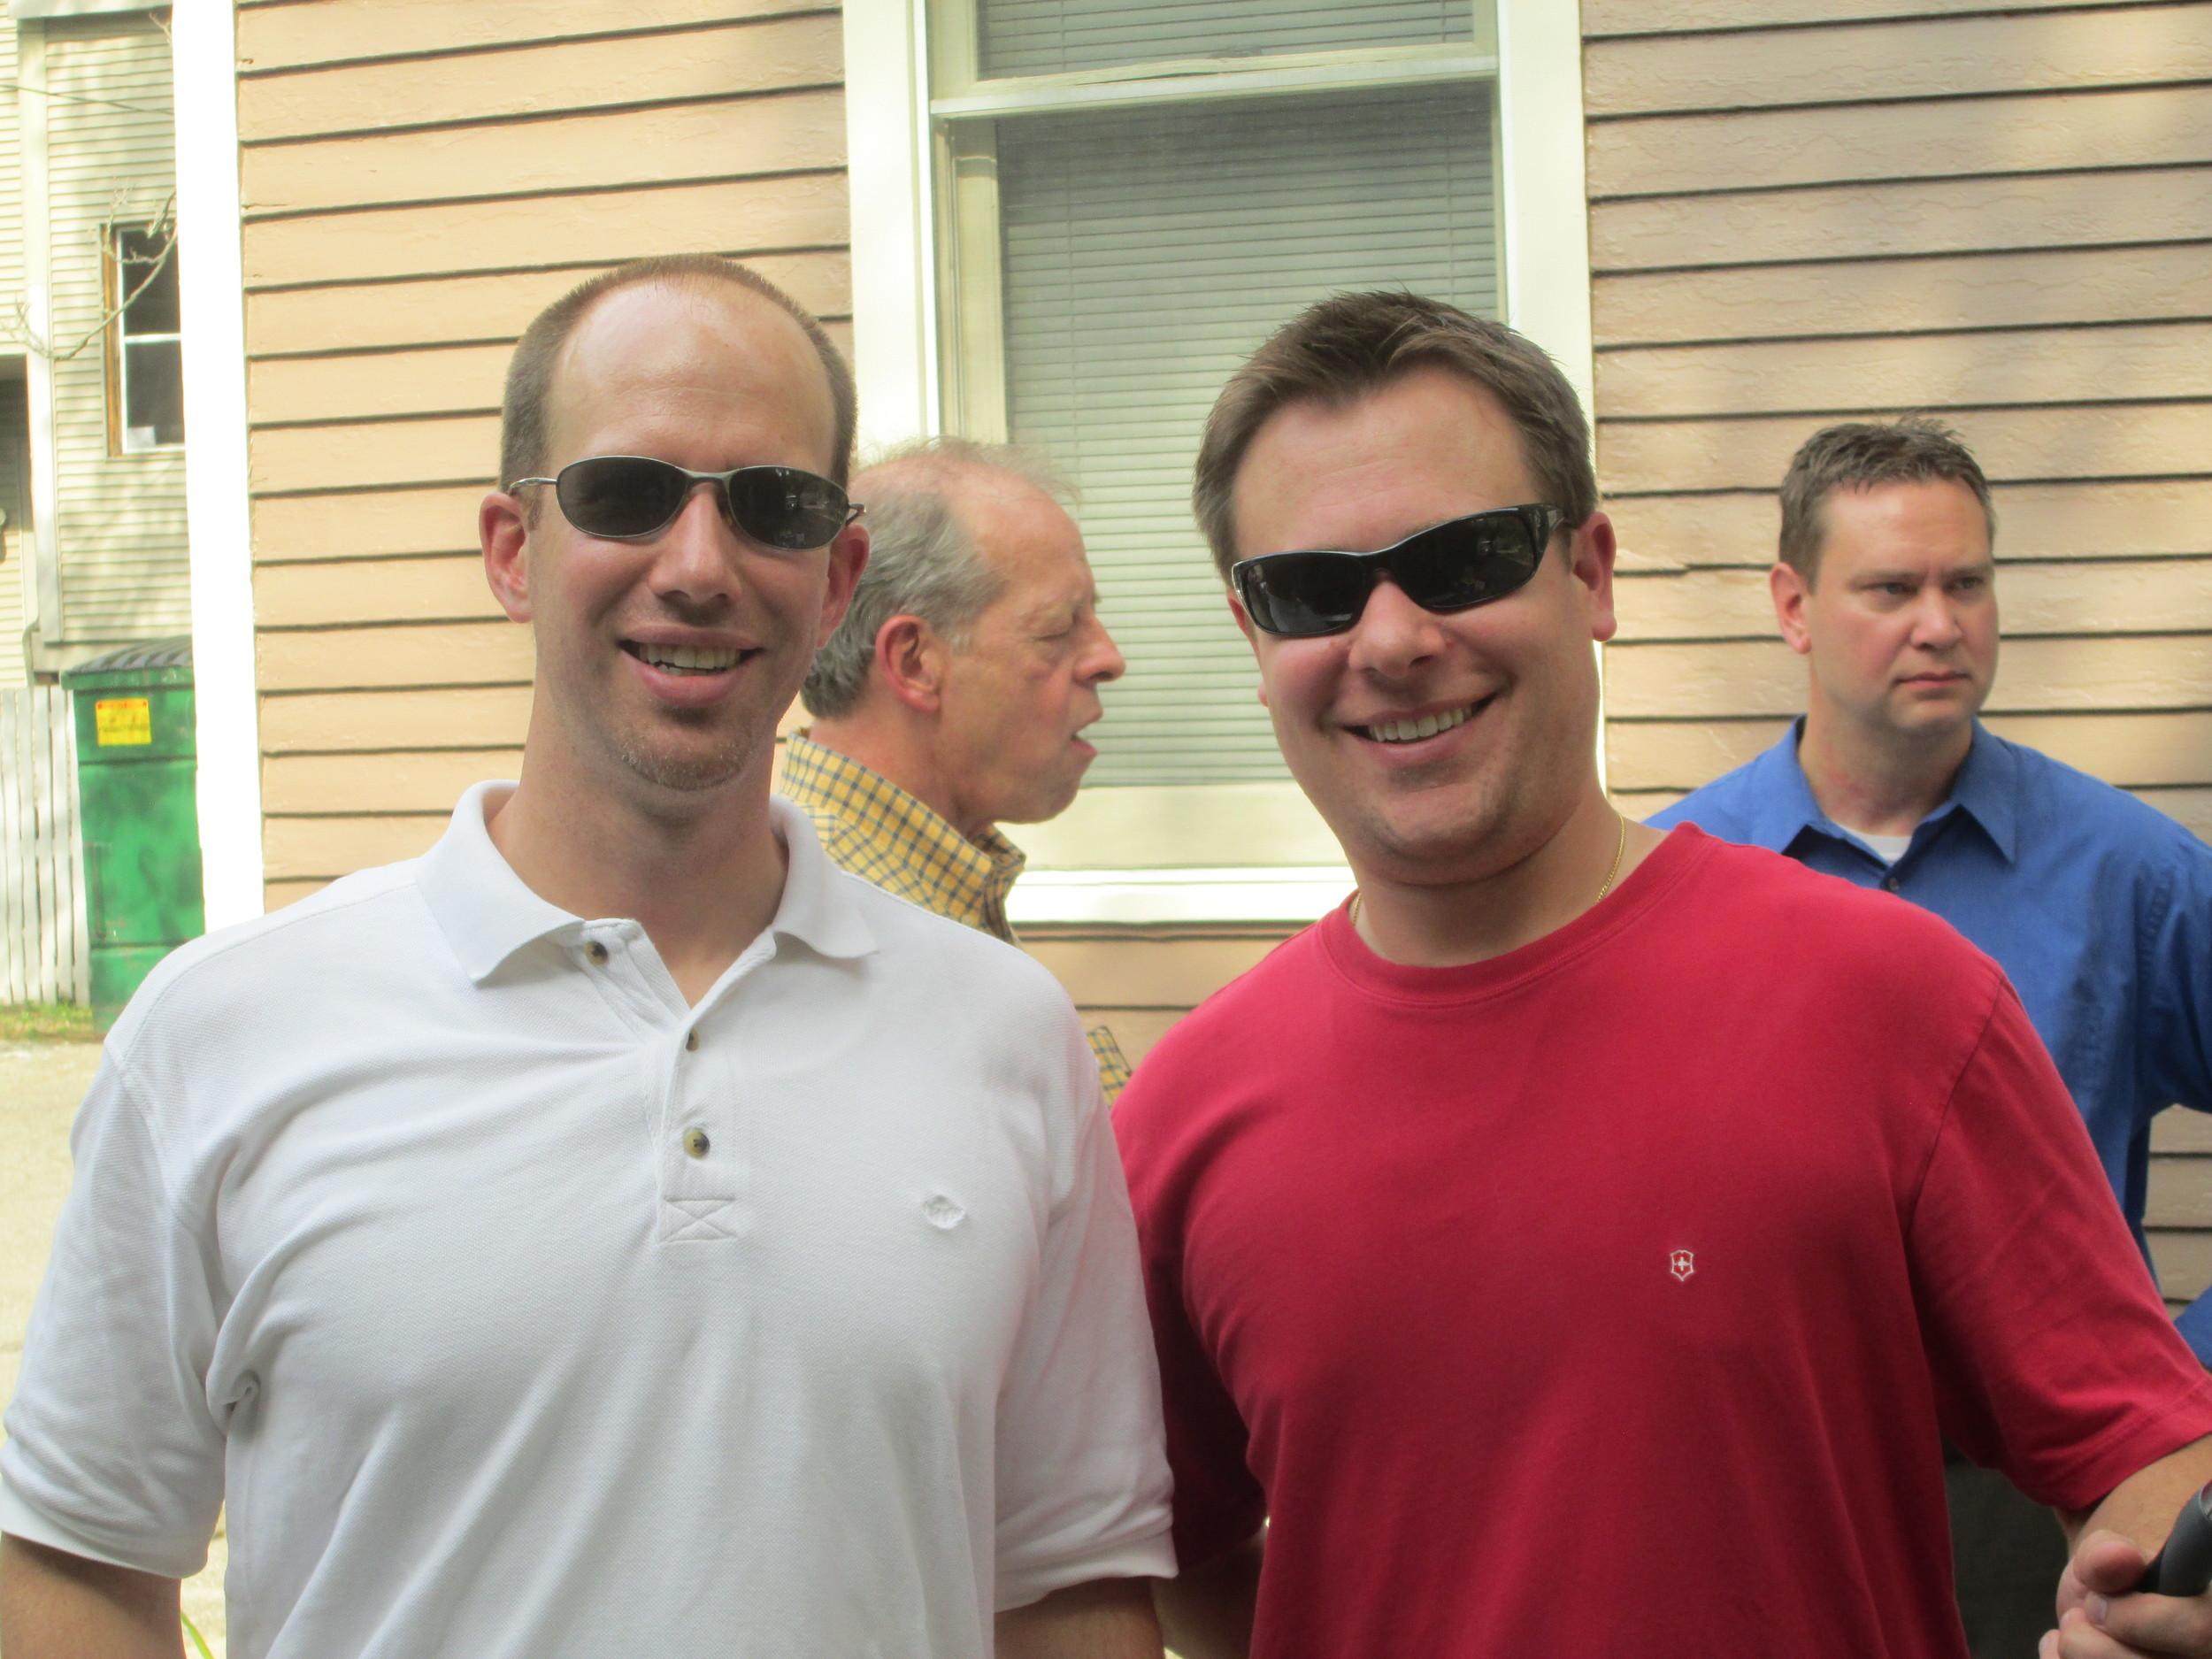 Thank you to our Grillmasters, Dan Pierce and Tony Kraatz!